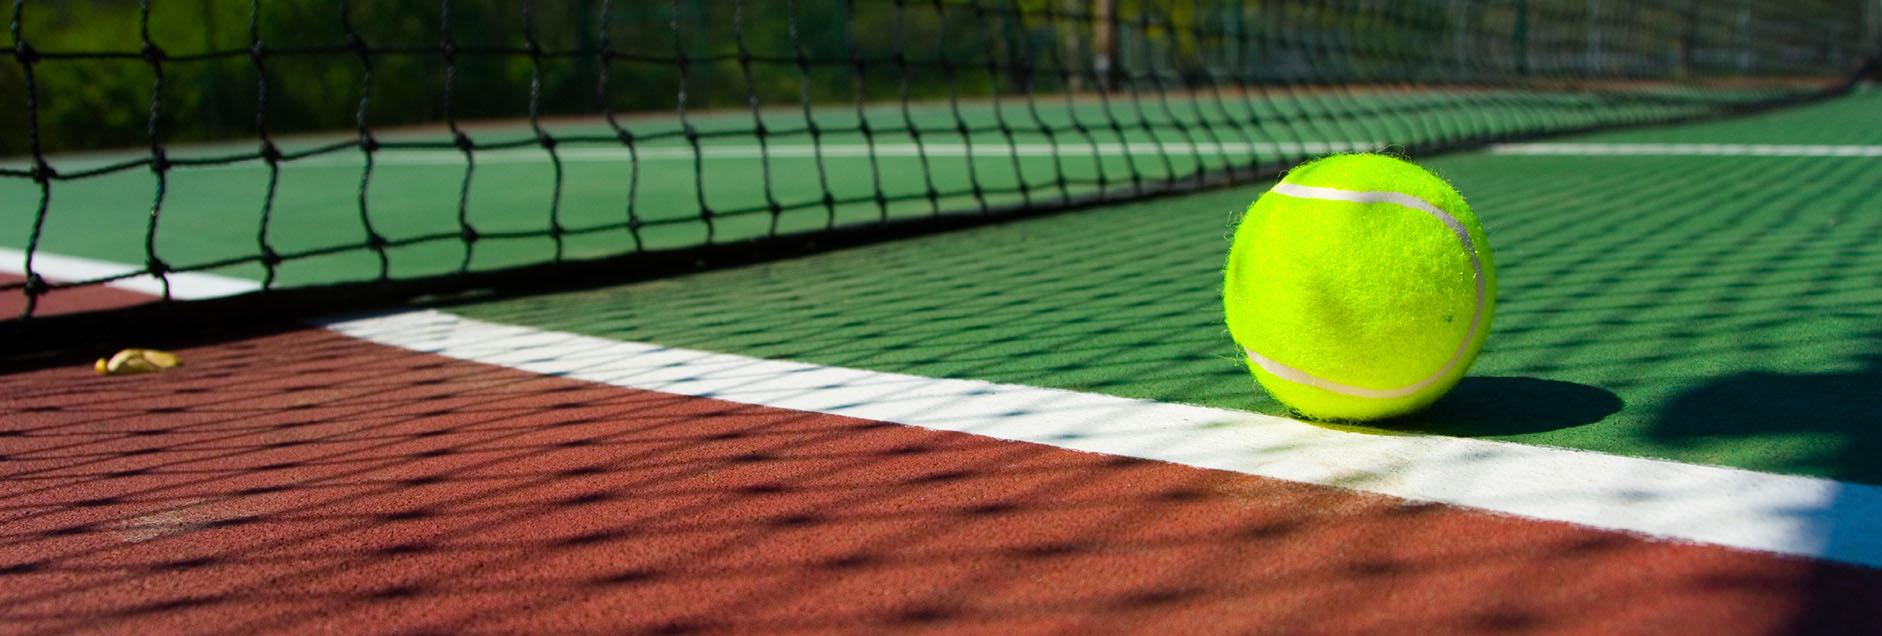 tennis-banner-3.jpg